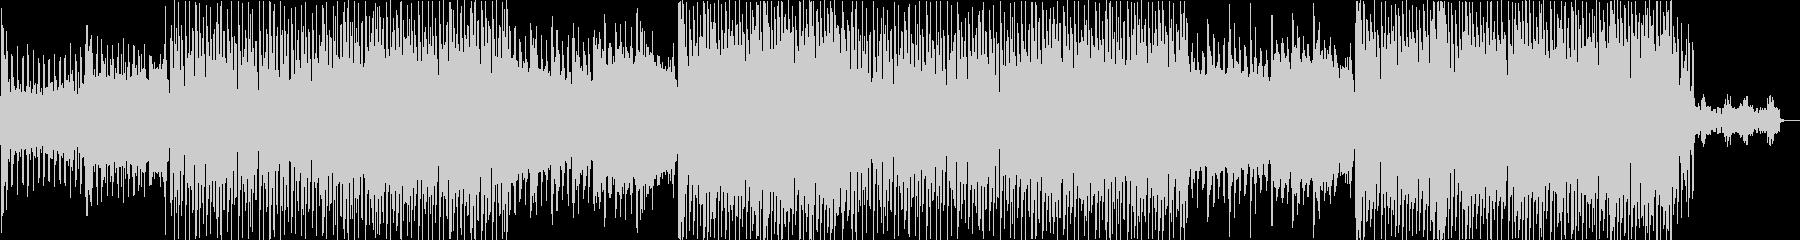 K-POP・激しいダークなレゲトンEDMの未再生の波形